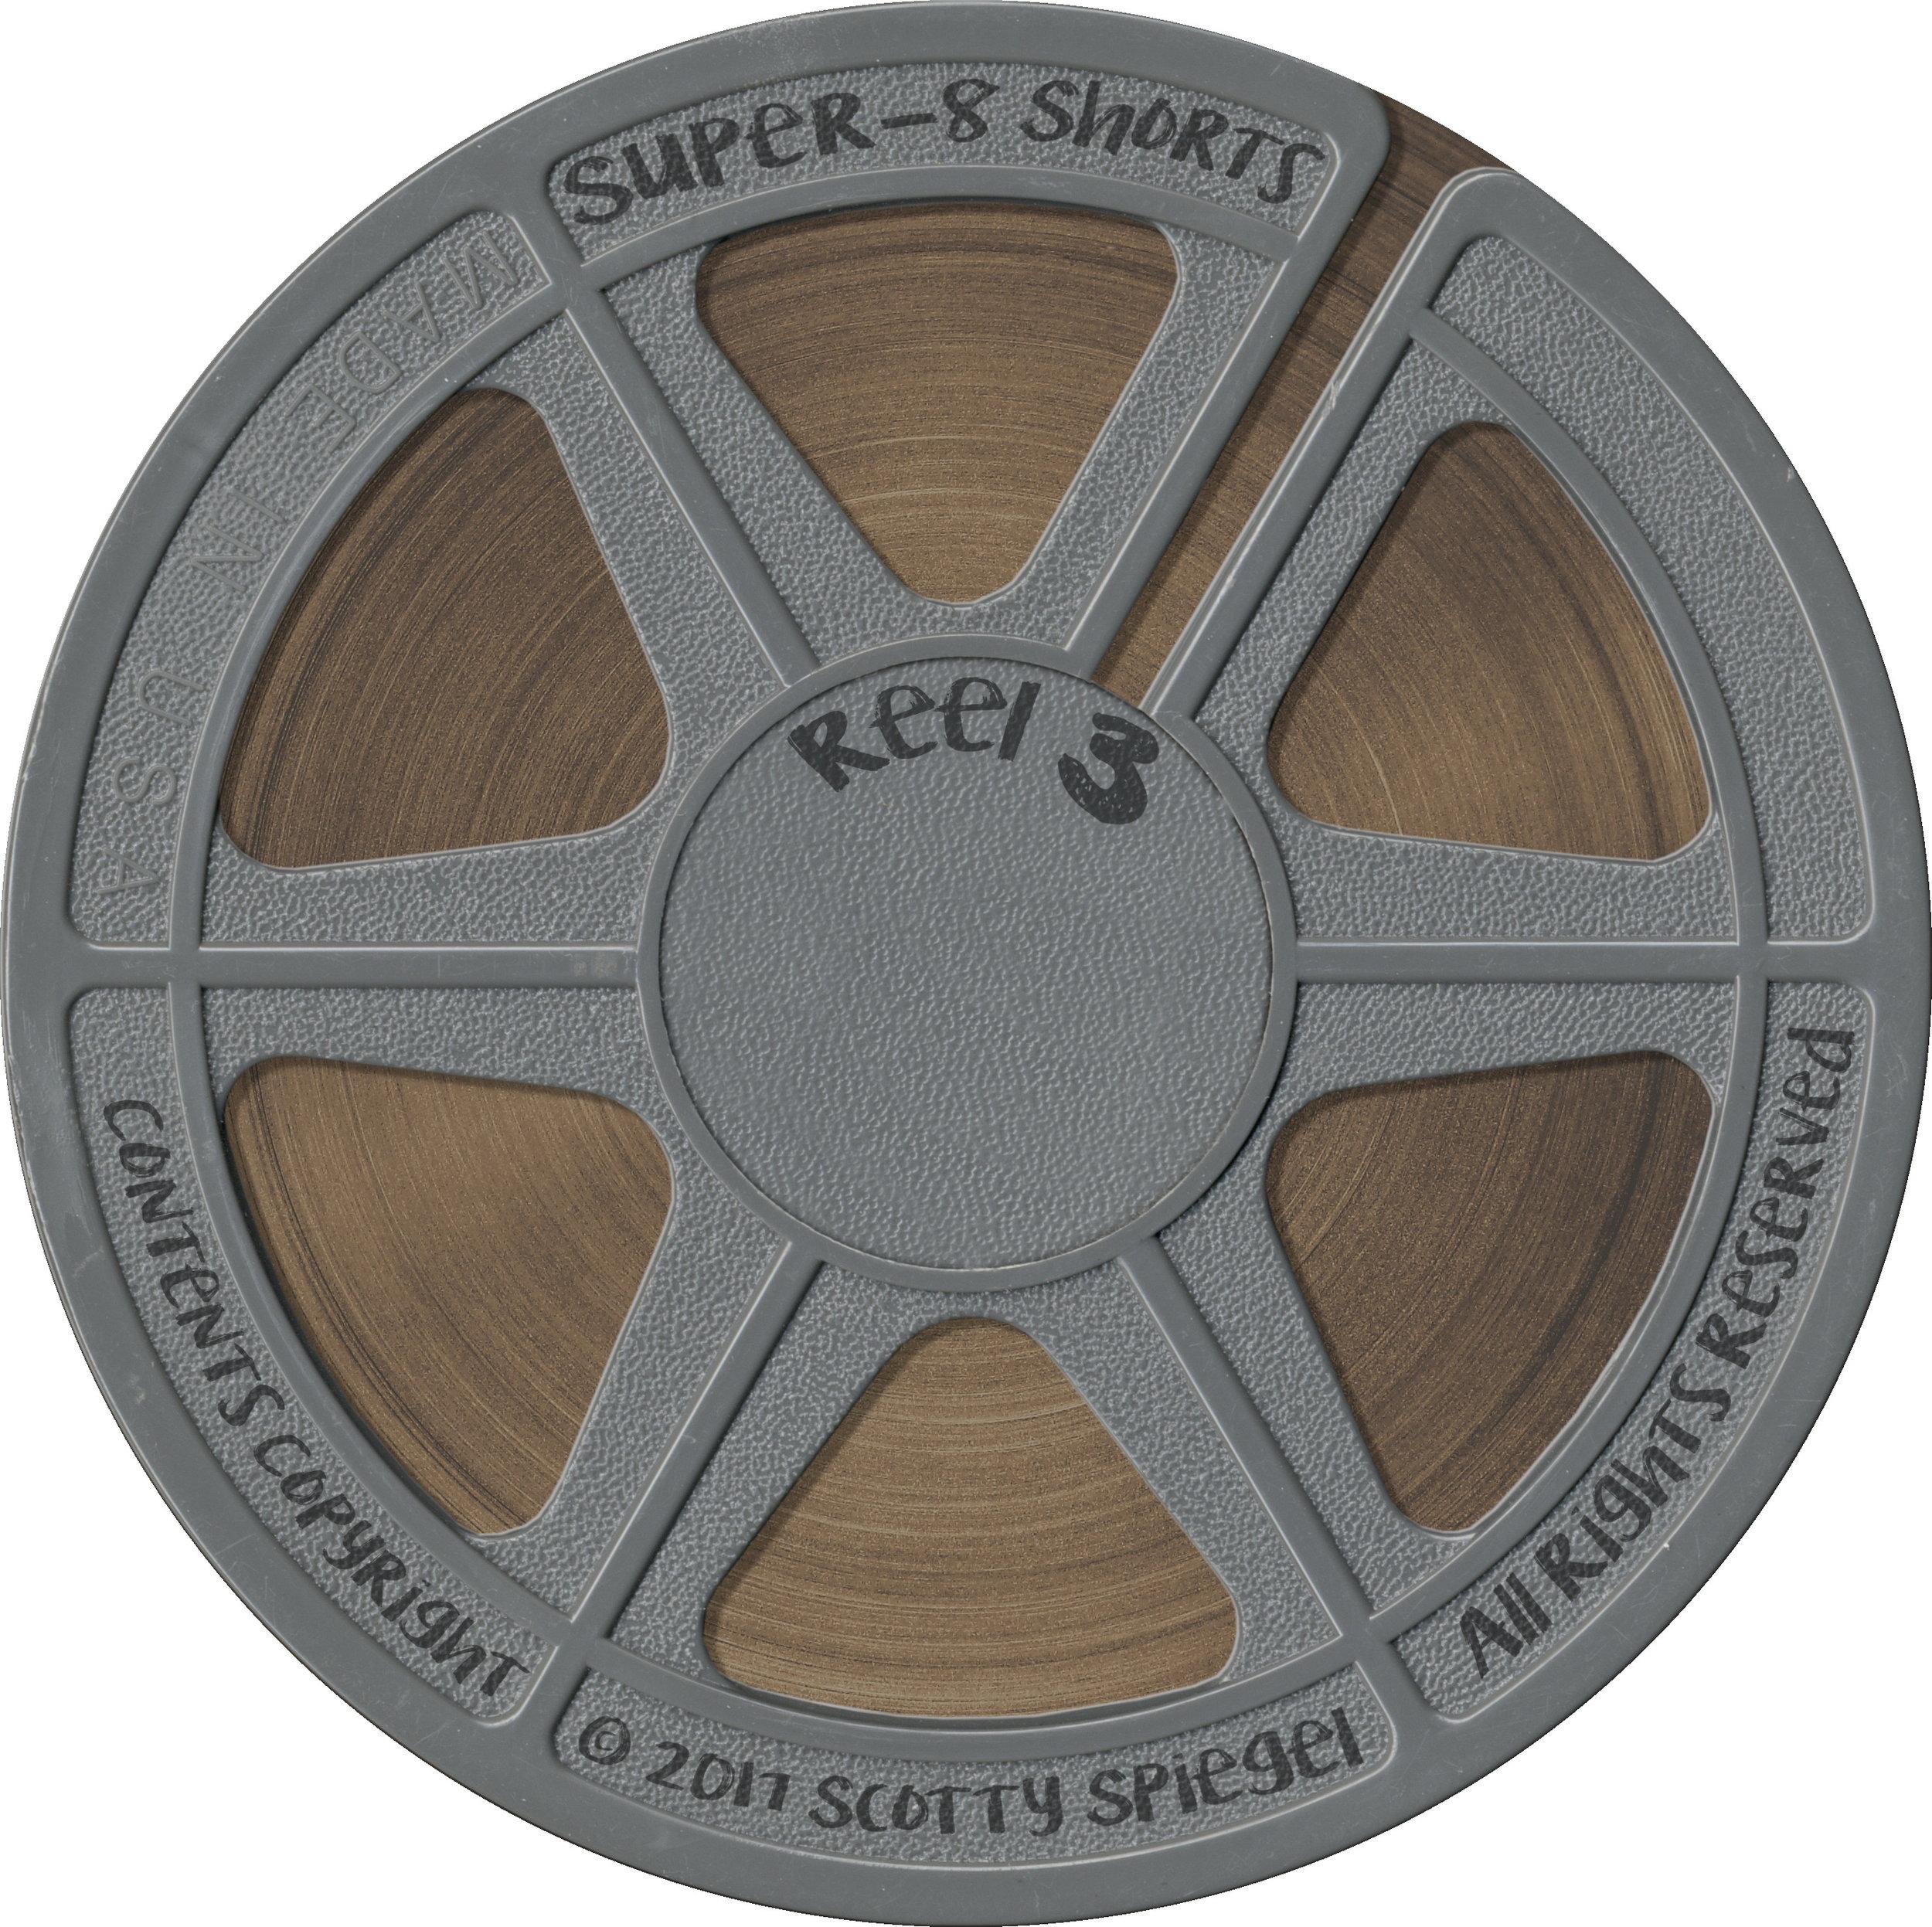 The Evil Dead Super-8 Short Films DVD3 Disc Art (2741px by 2734px - 600dpi).jpg